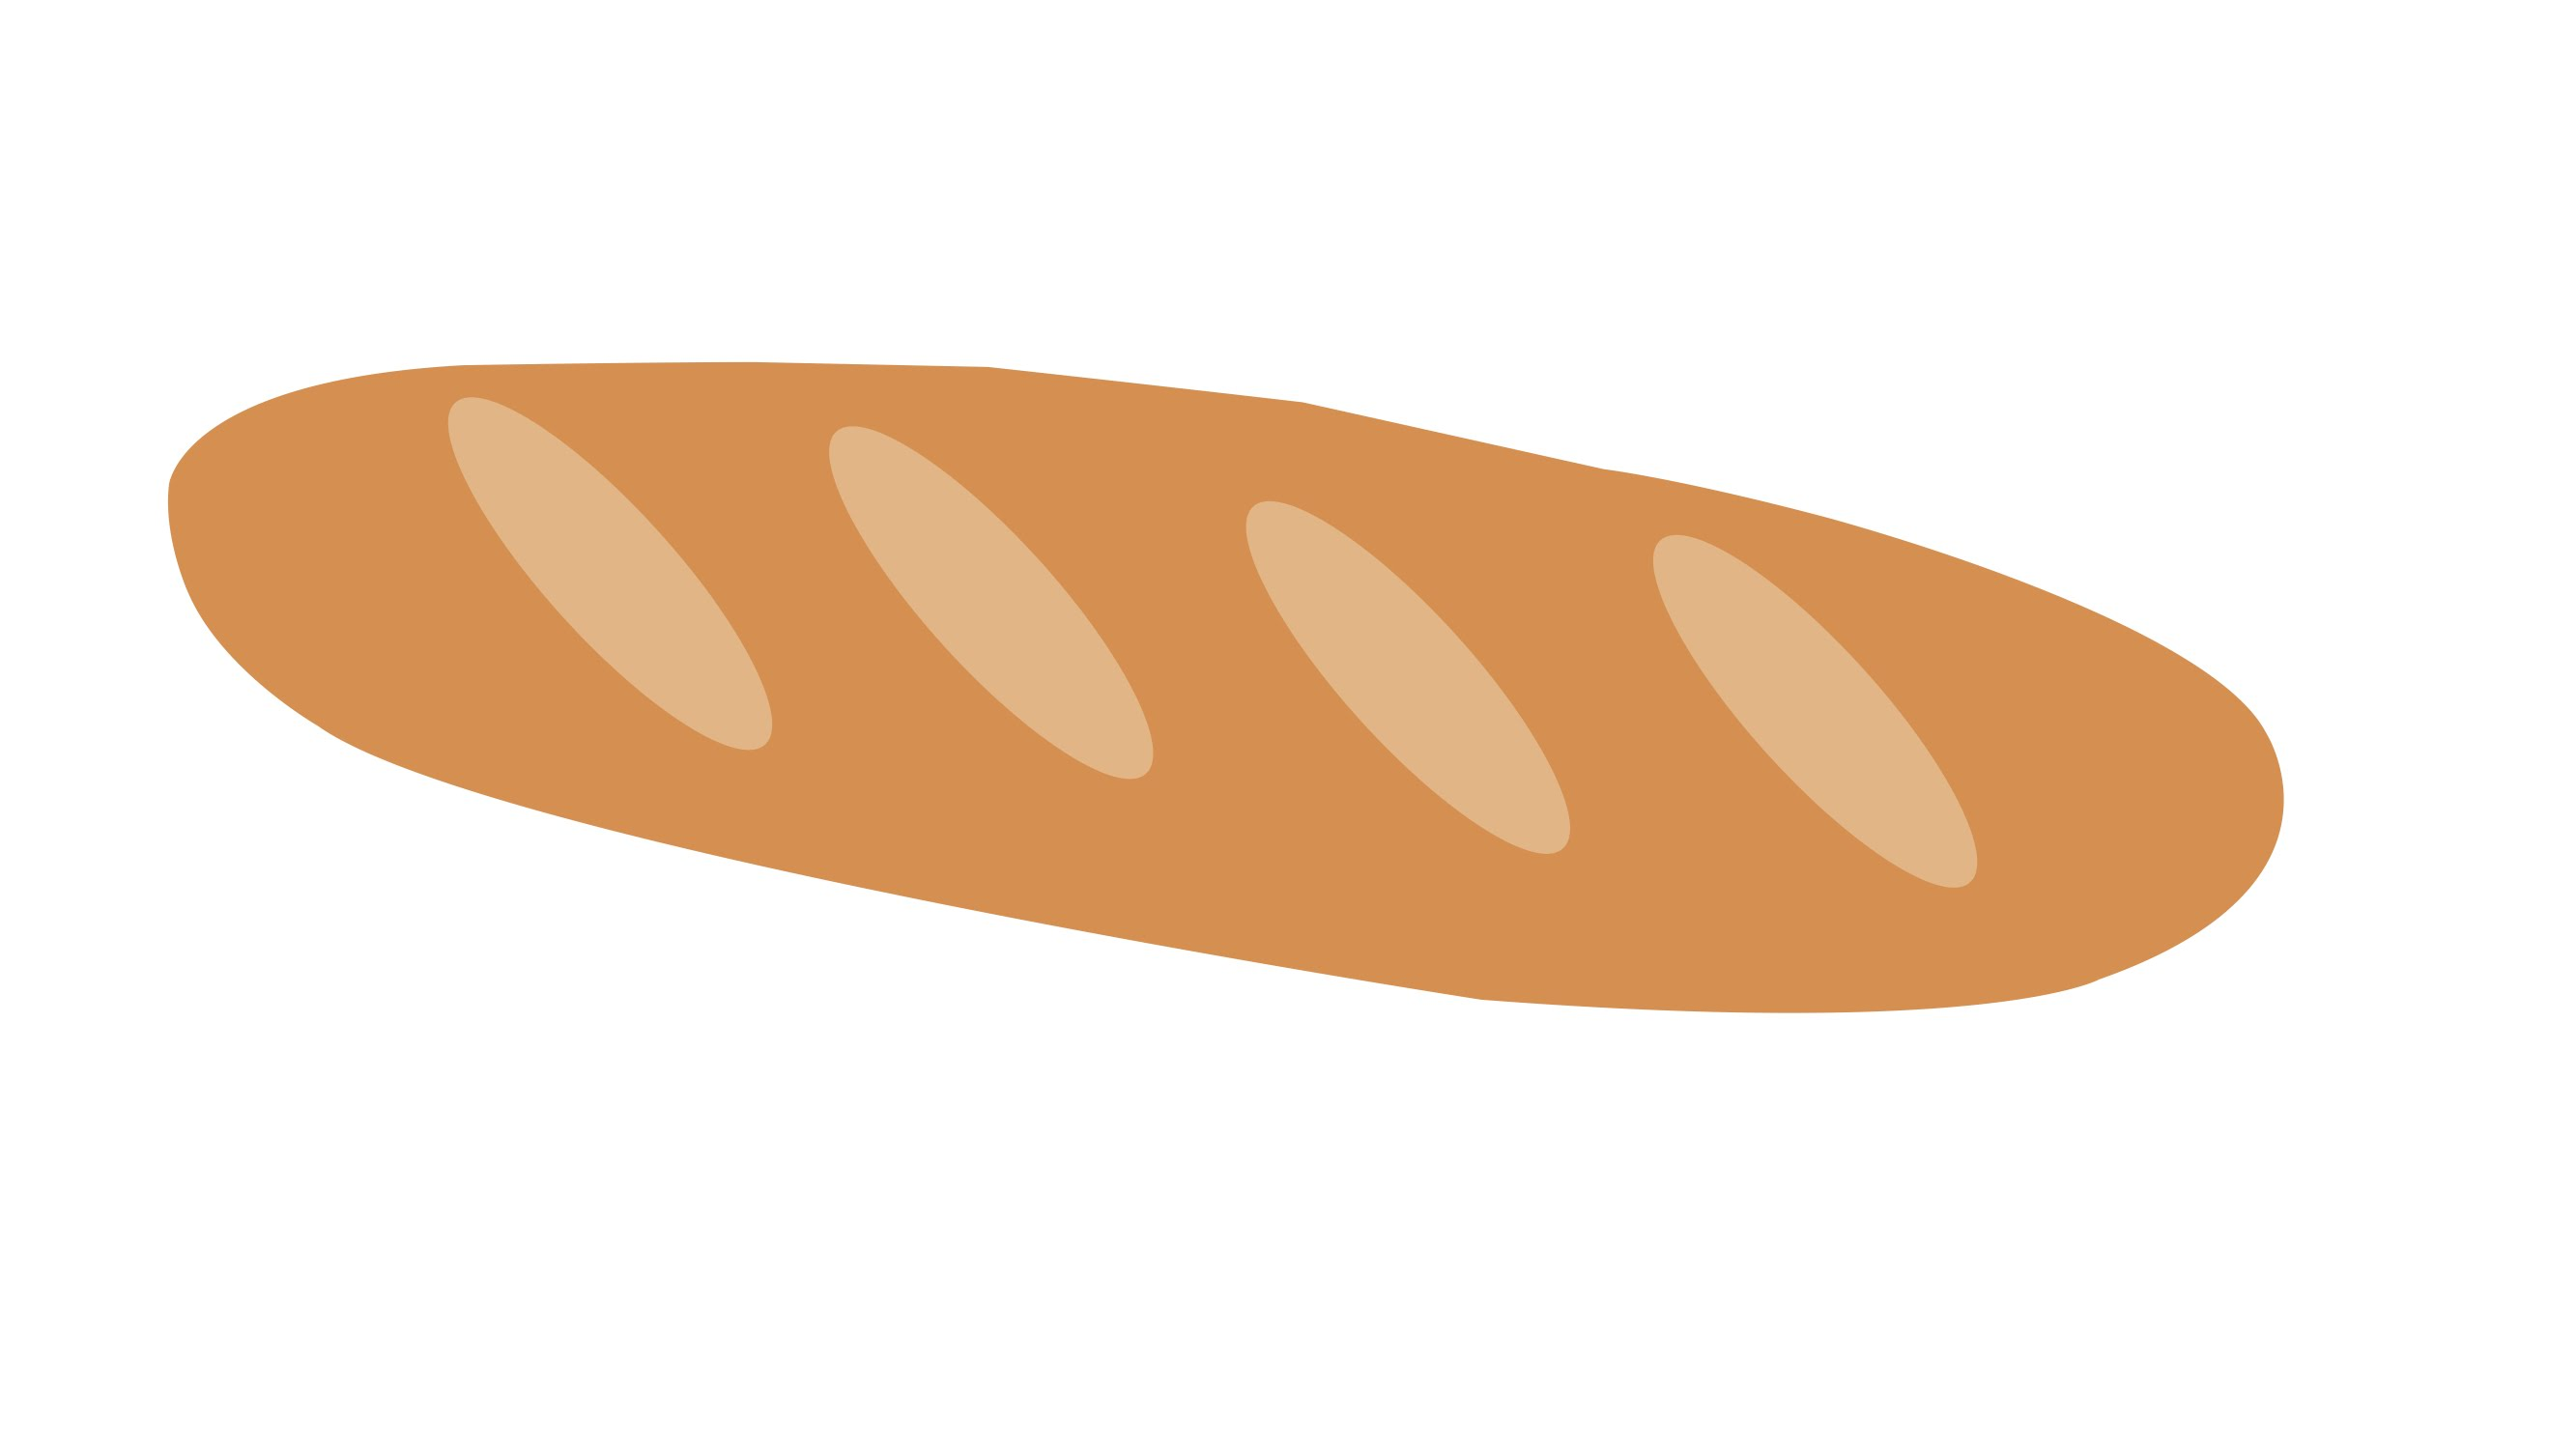 Drawn bread loaf bread How Bread draw a to